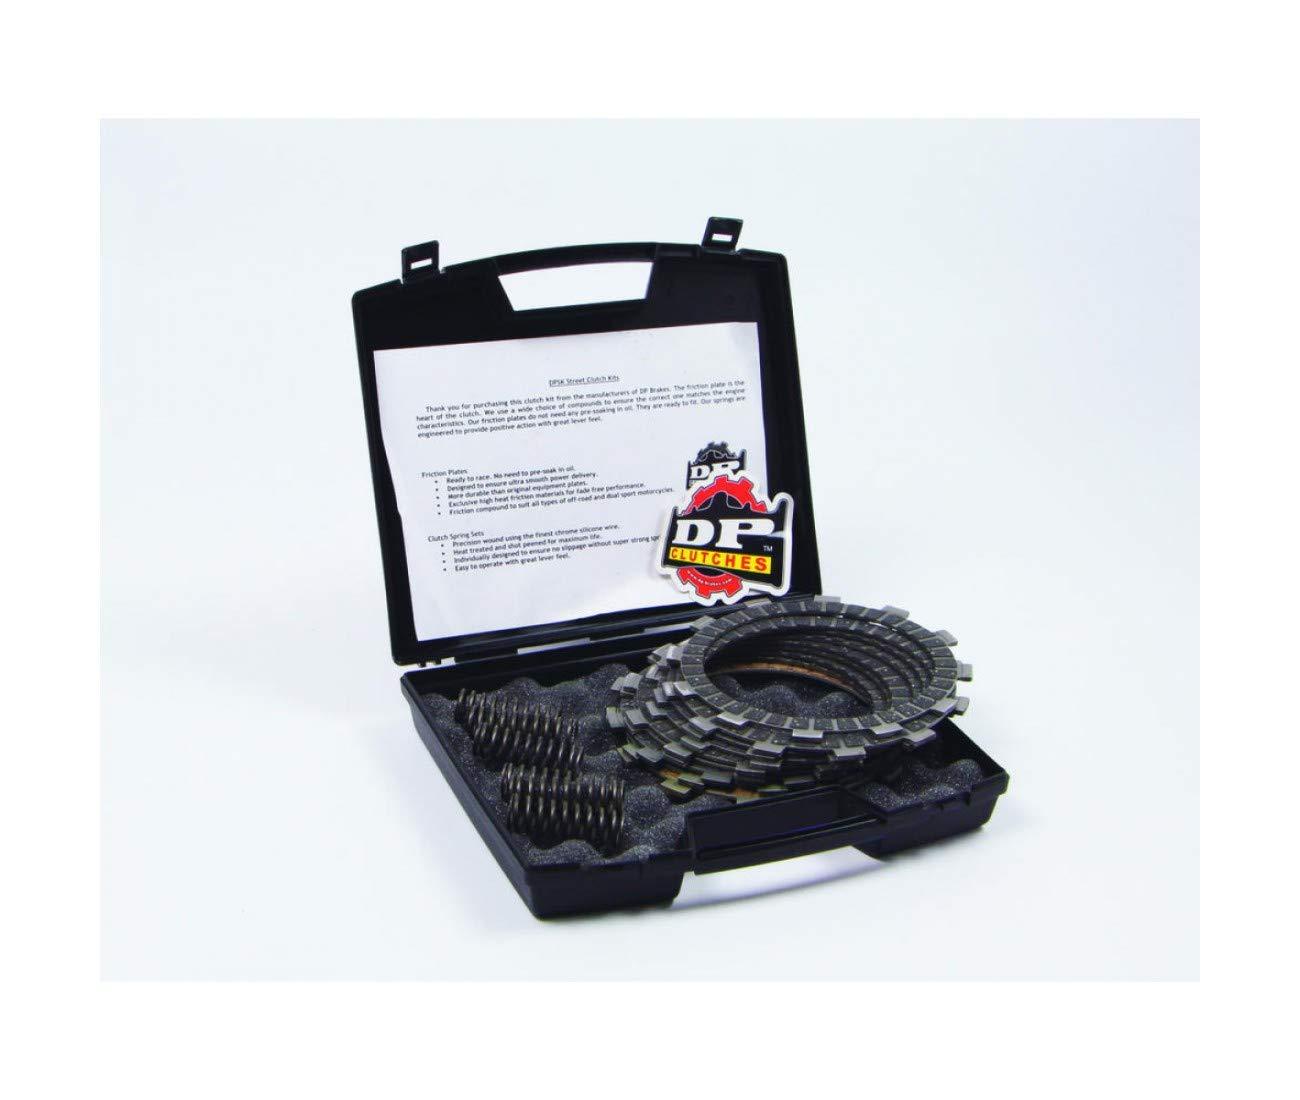 KIT EMBRAYAGE DP HAUTE PERFORMANCE-DPSK229 YAMAHA 1000 FZR EXUP-93//95